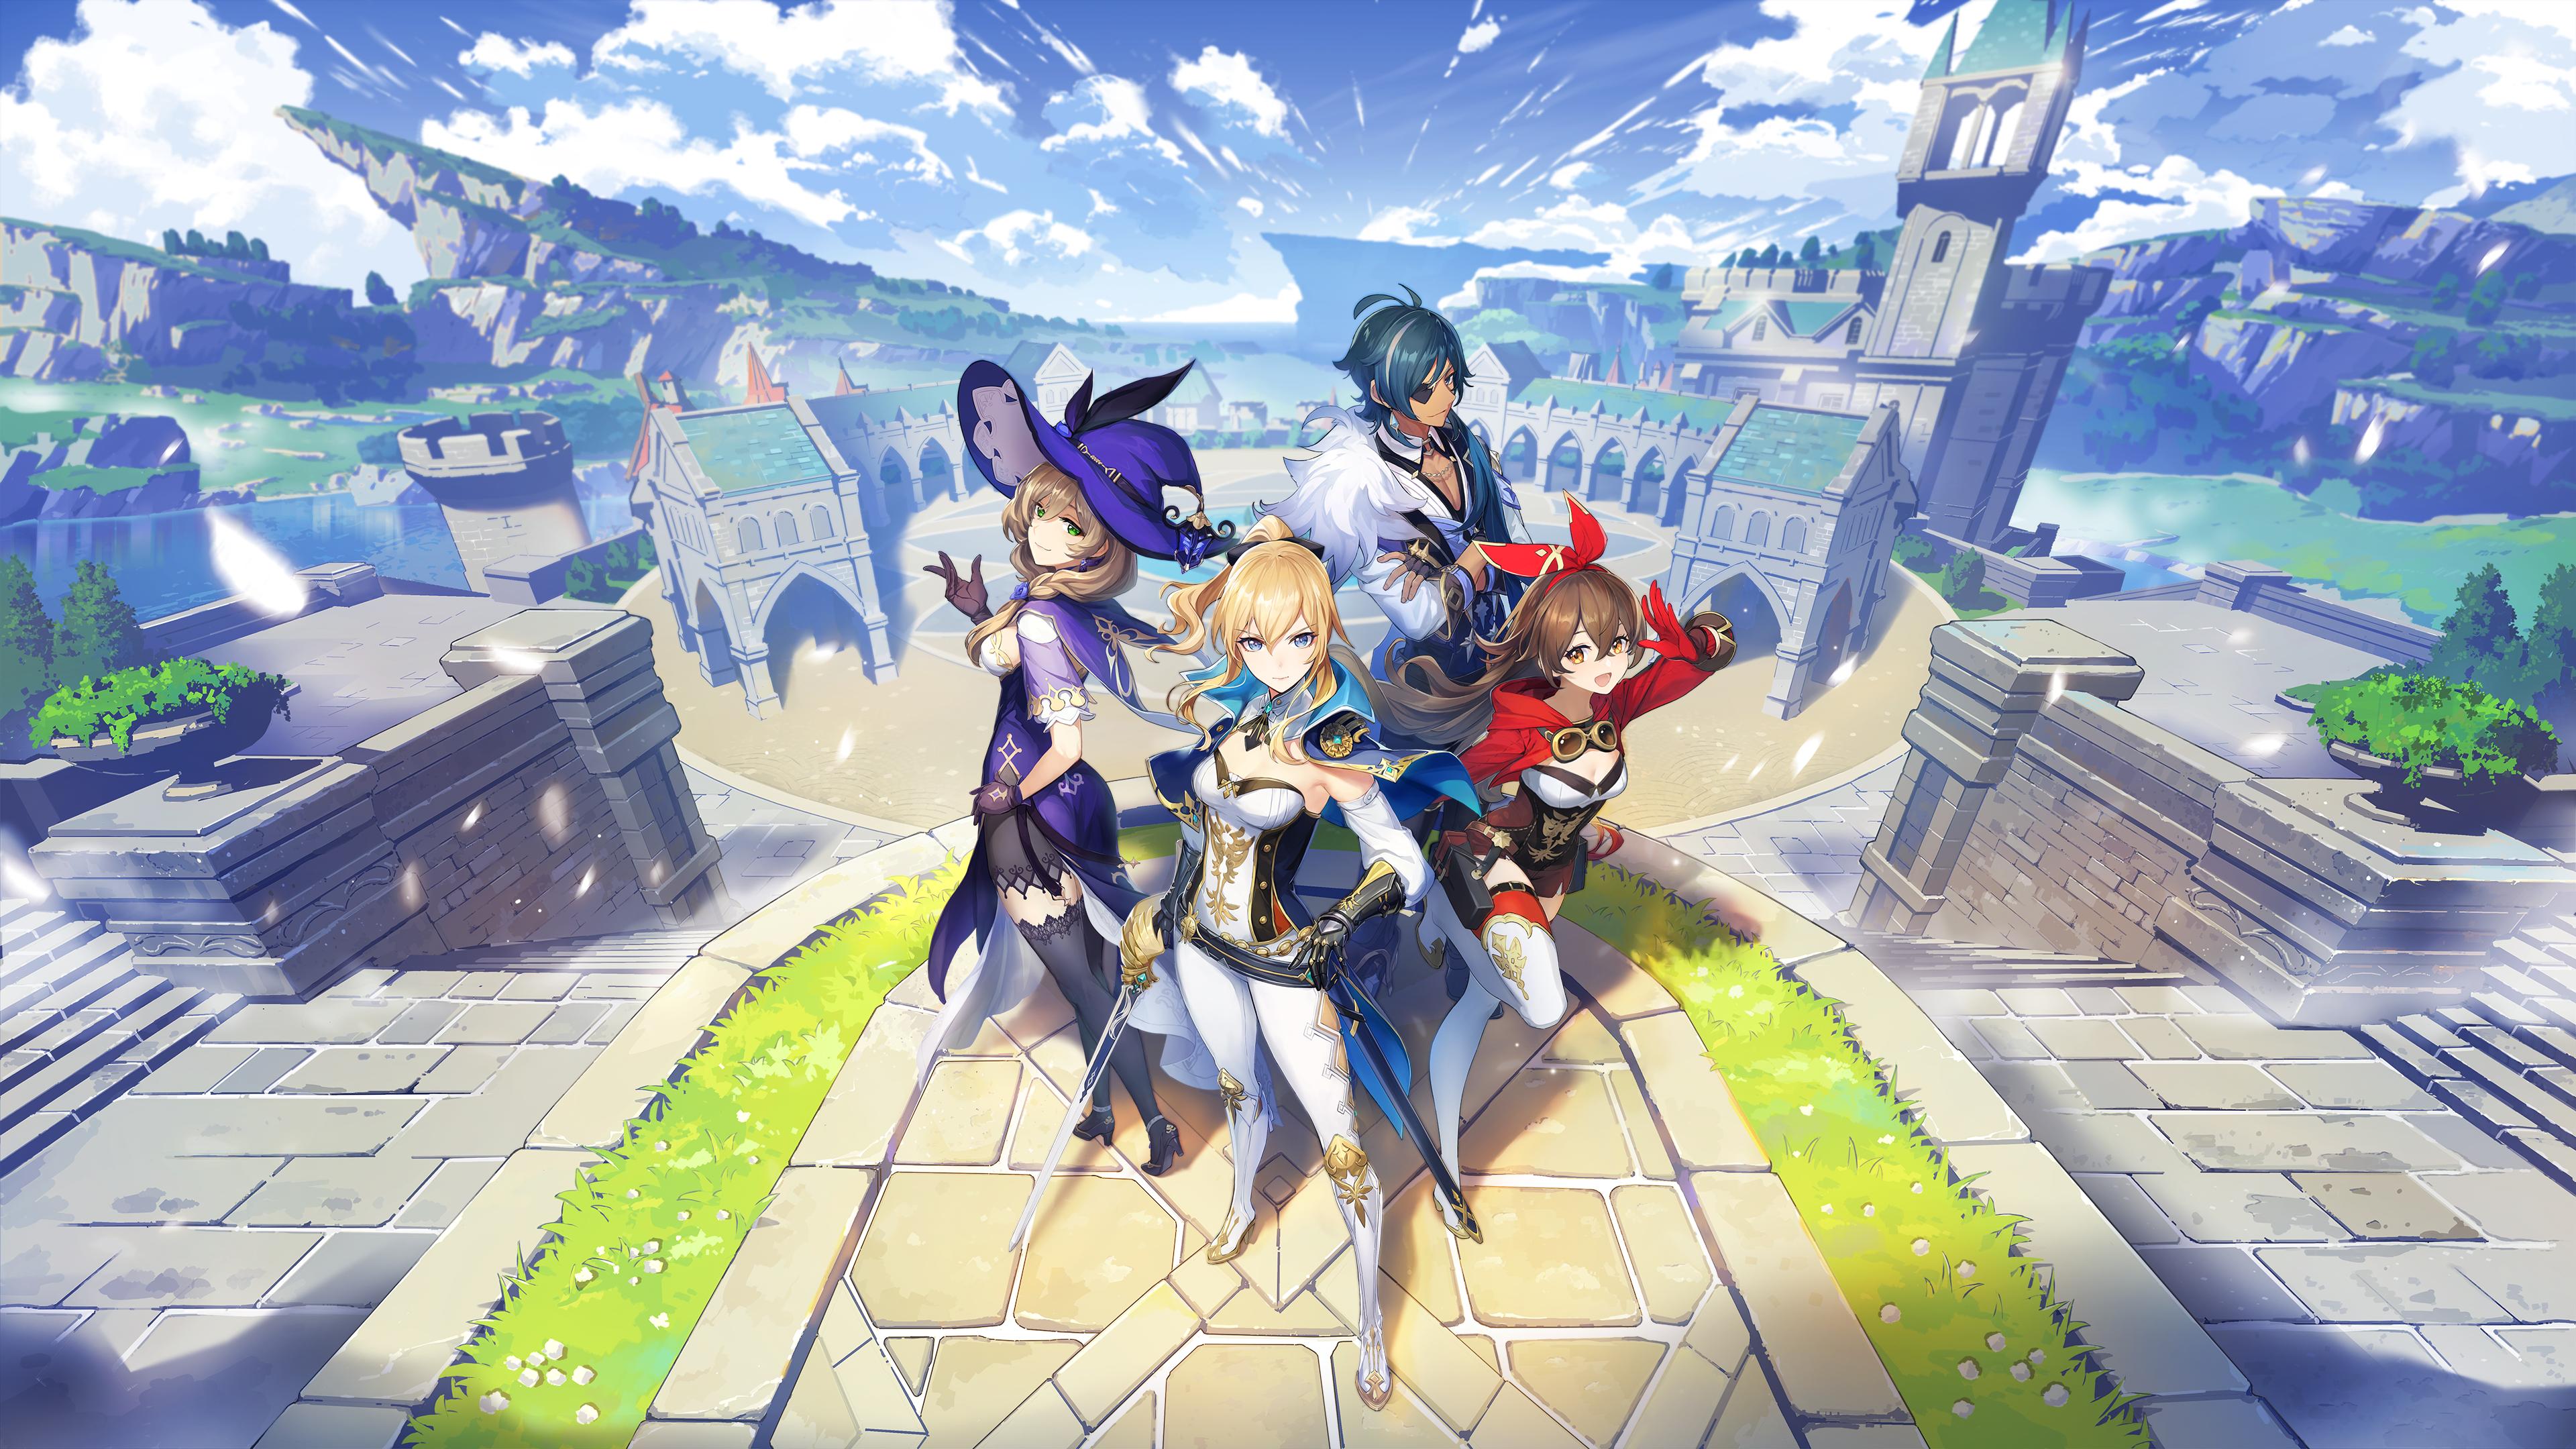 Genshin Impact Final Closed Beta Ps4 Gameplay Lords Of Gaming